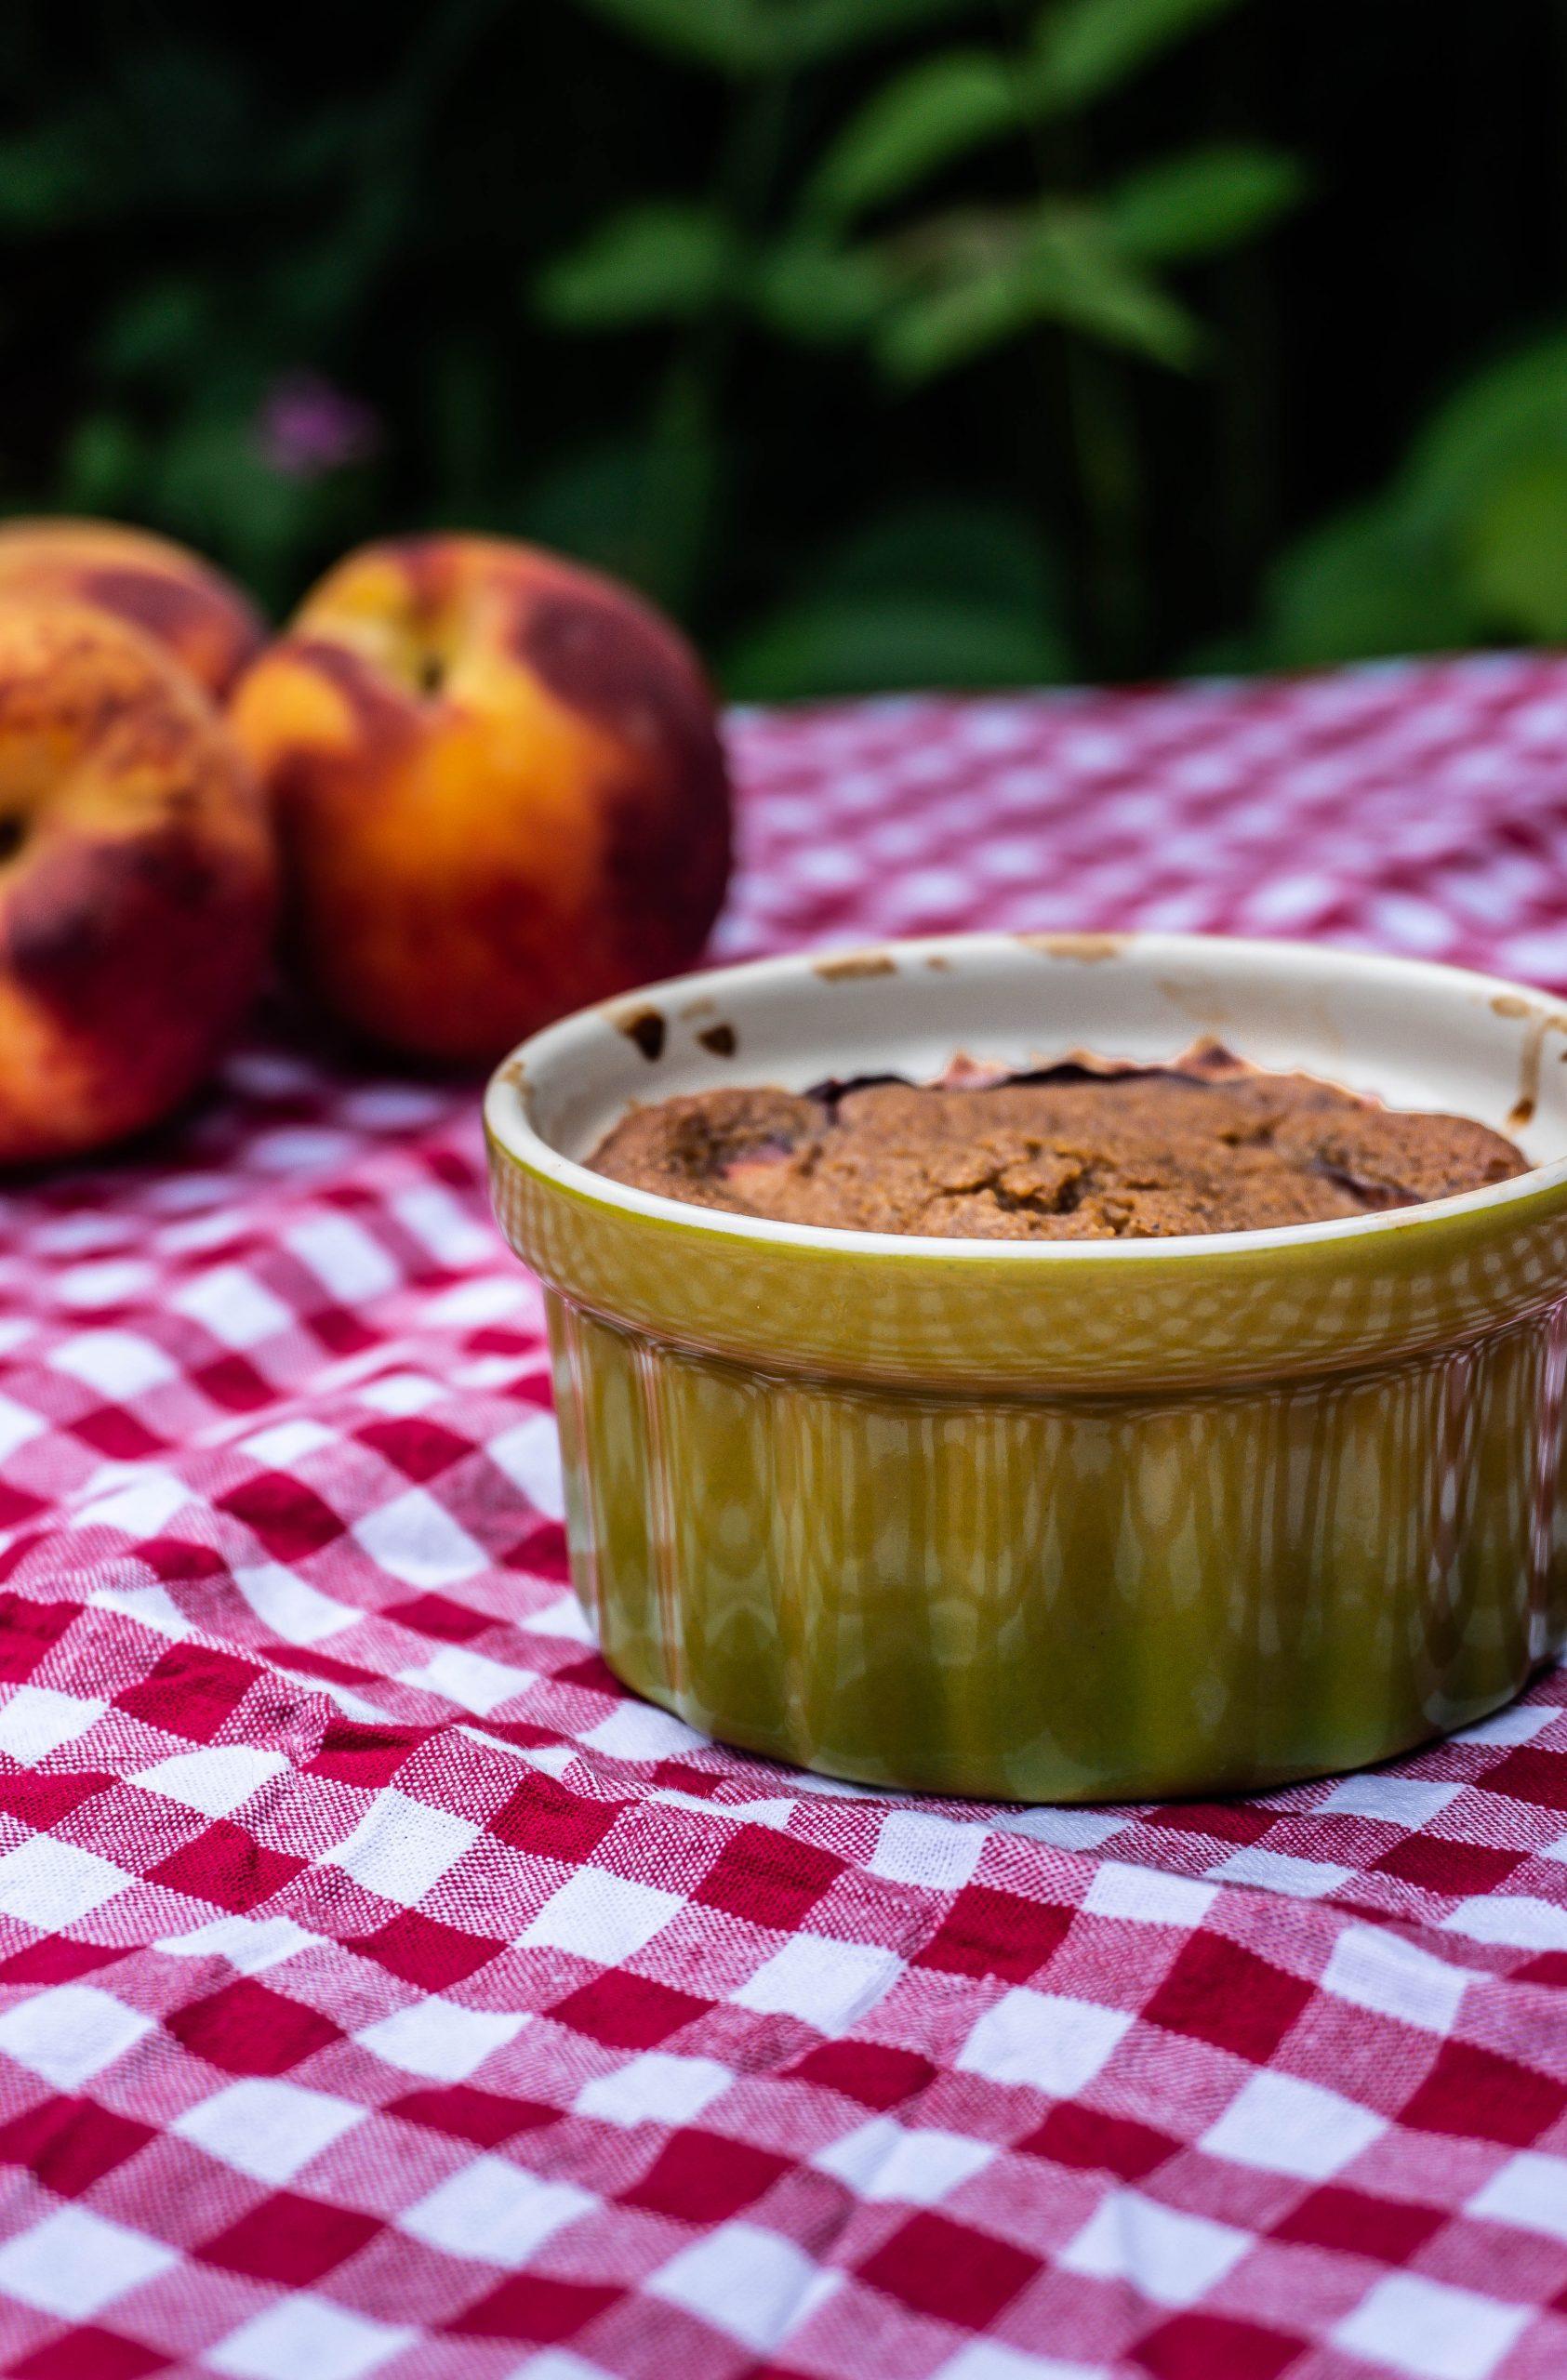 Mini Peach Cobbler in a small ramekin with peaches in the background